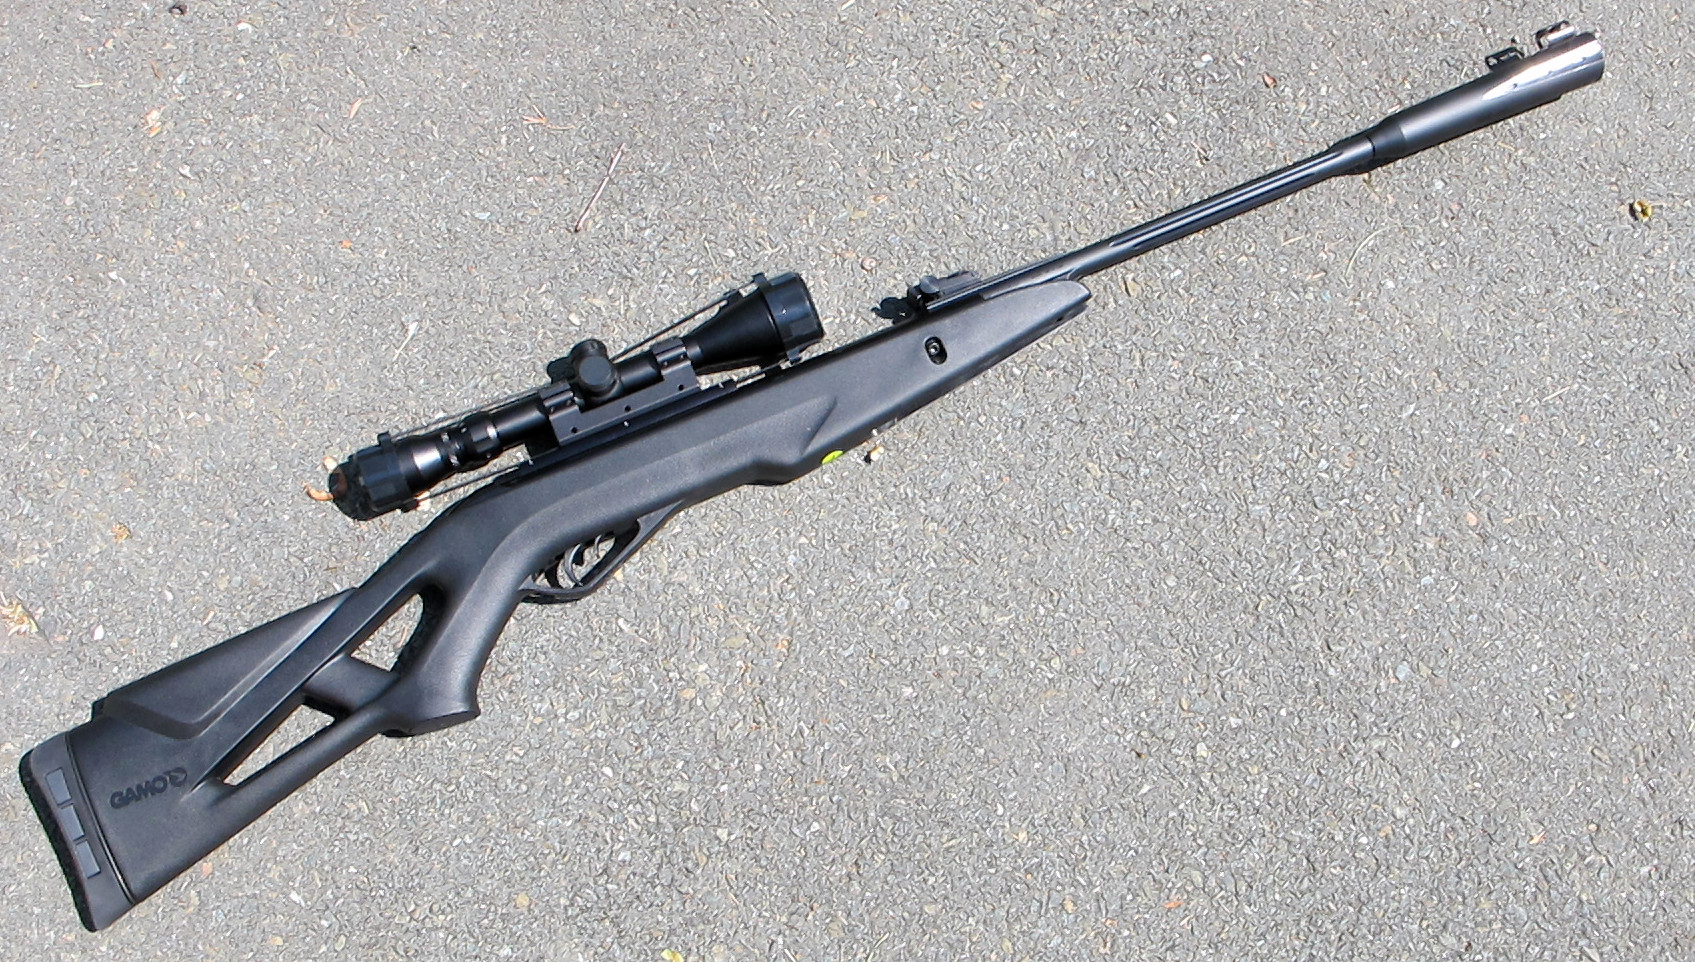 Gamo Whisper Rifle 177 Cat Silent Caliber Air